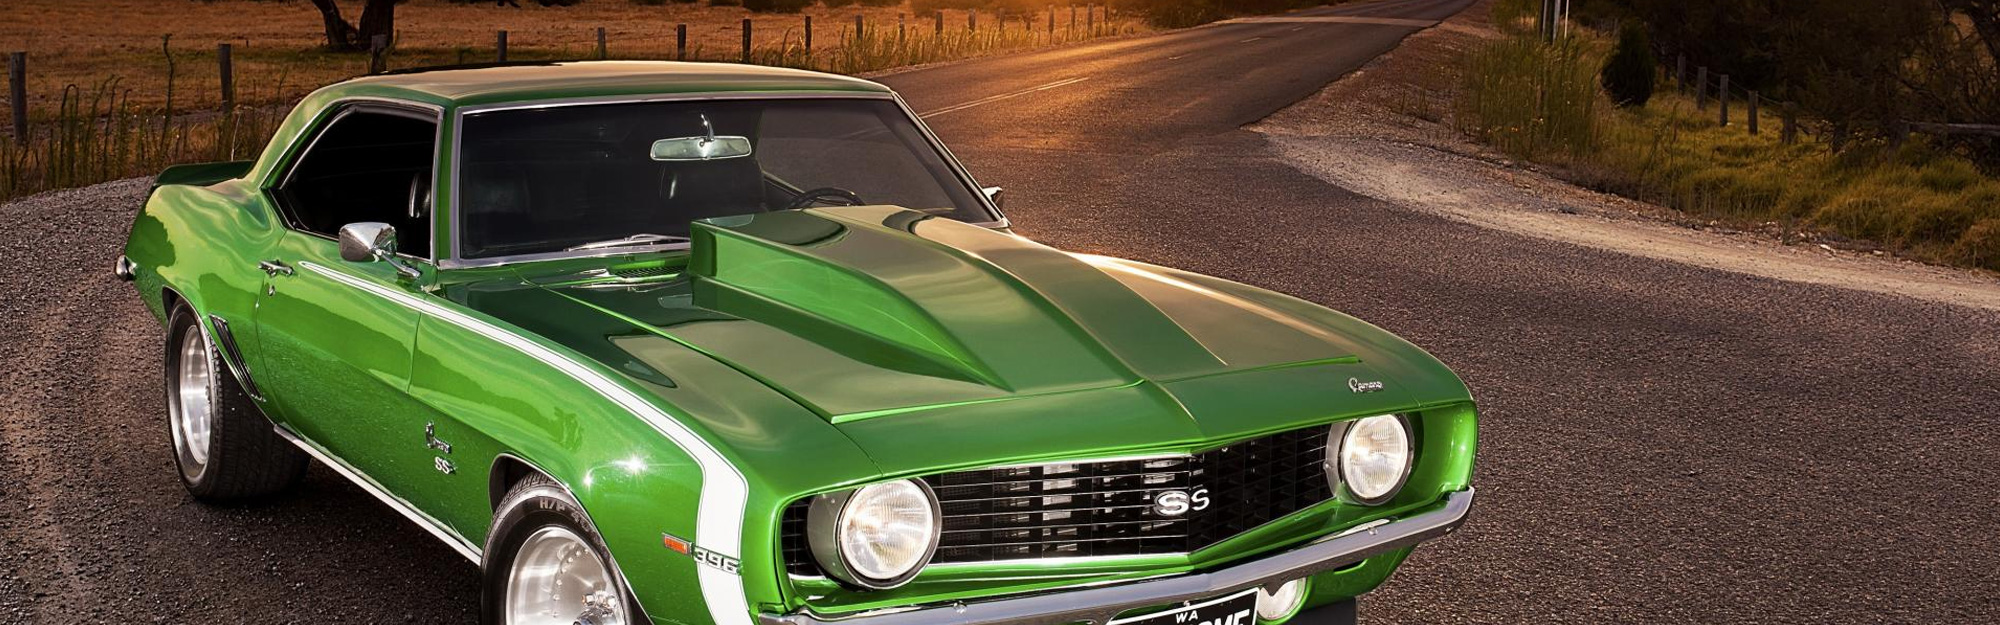 Pacific garage vente restauration de voitures americaines for Vente de voiture garage